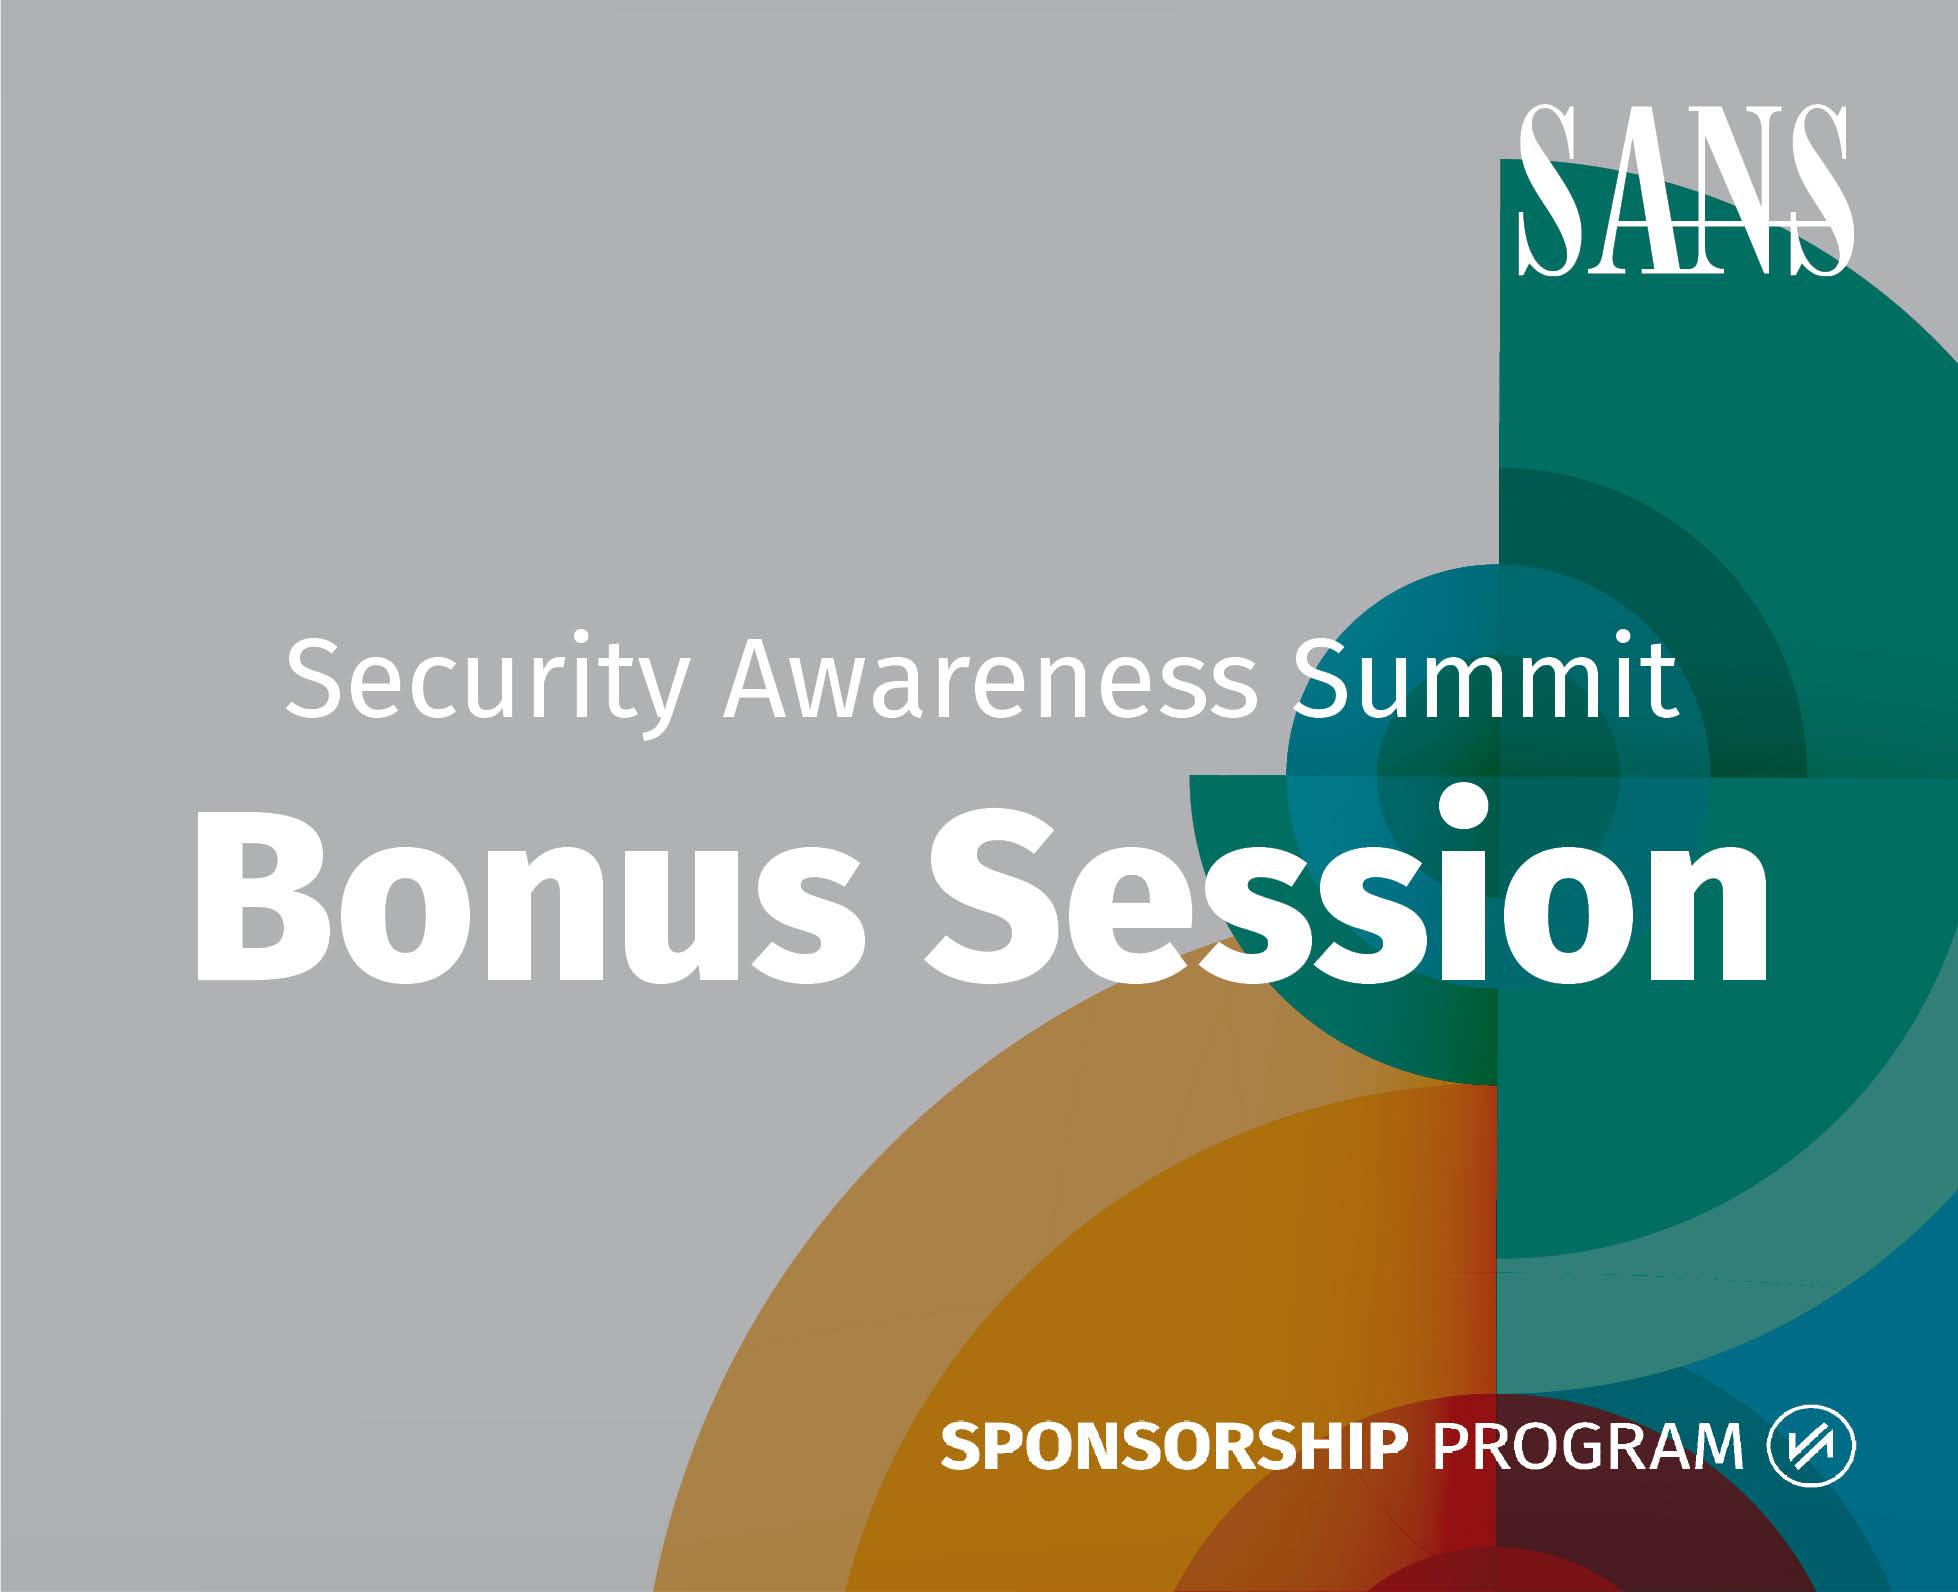 Security_Awareness_Summit_Bonus_Session.jpg